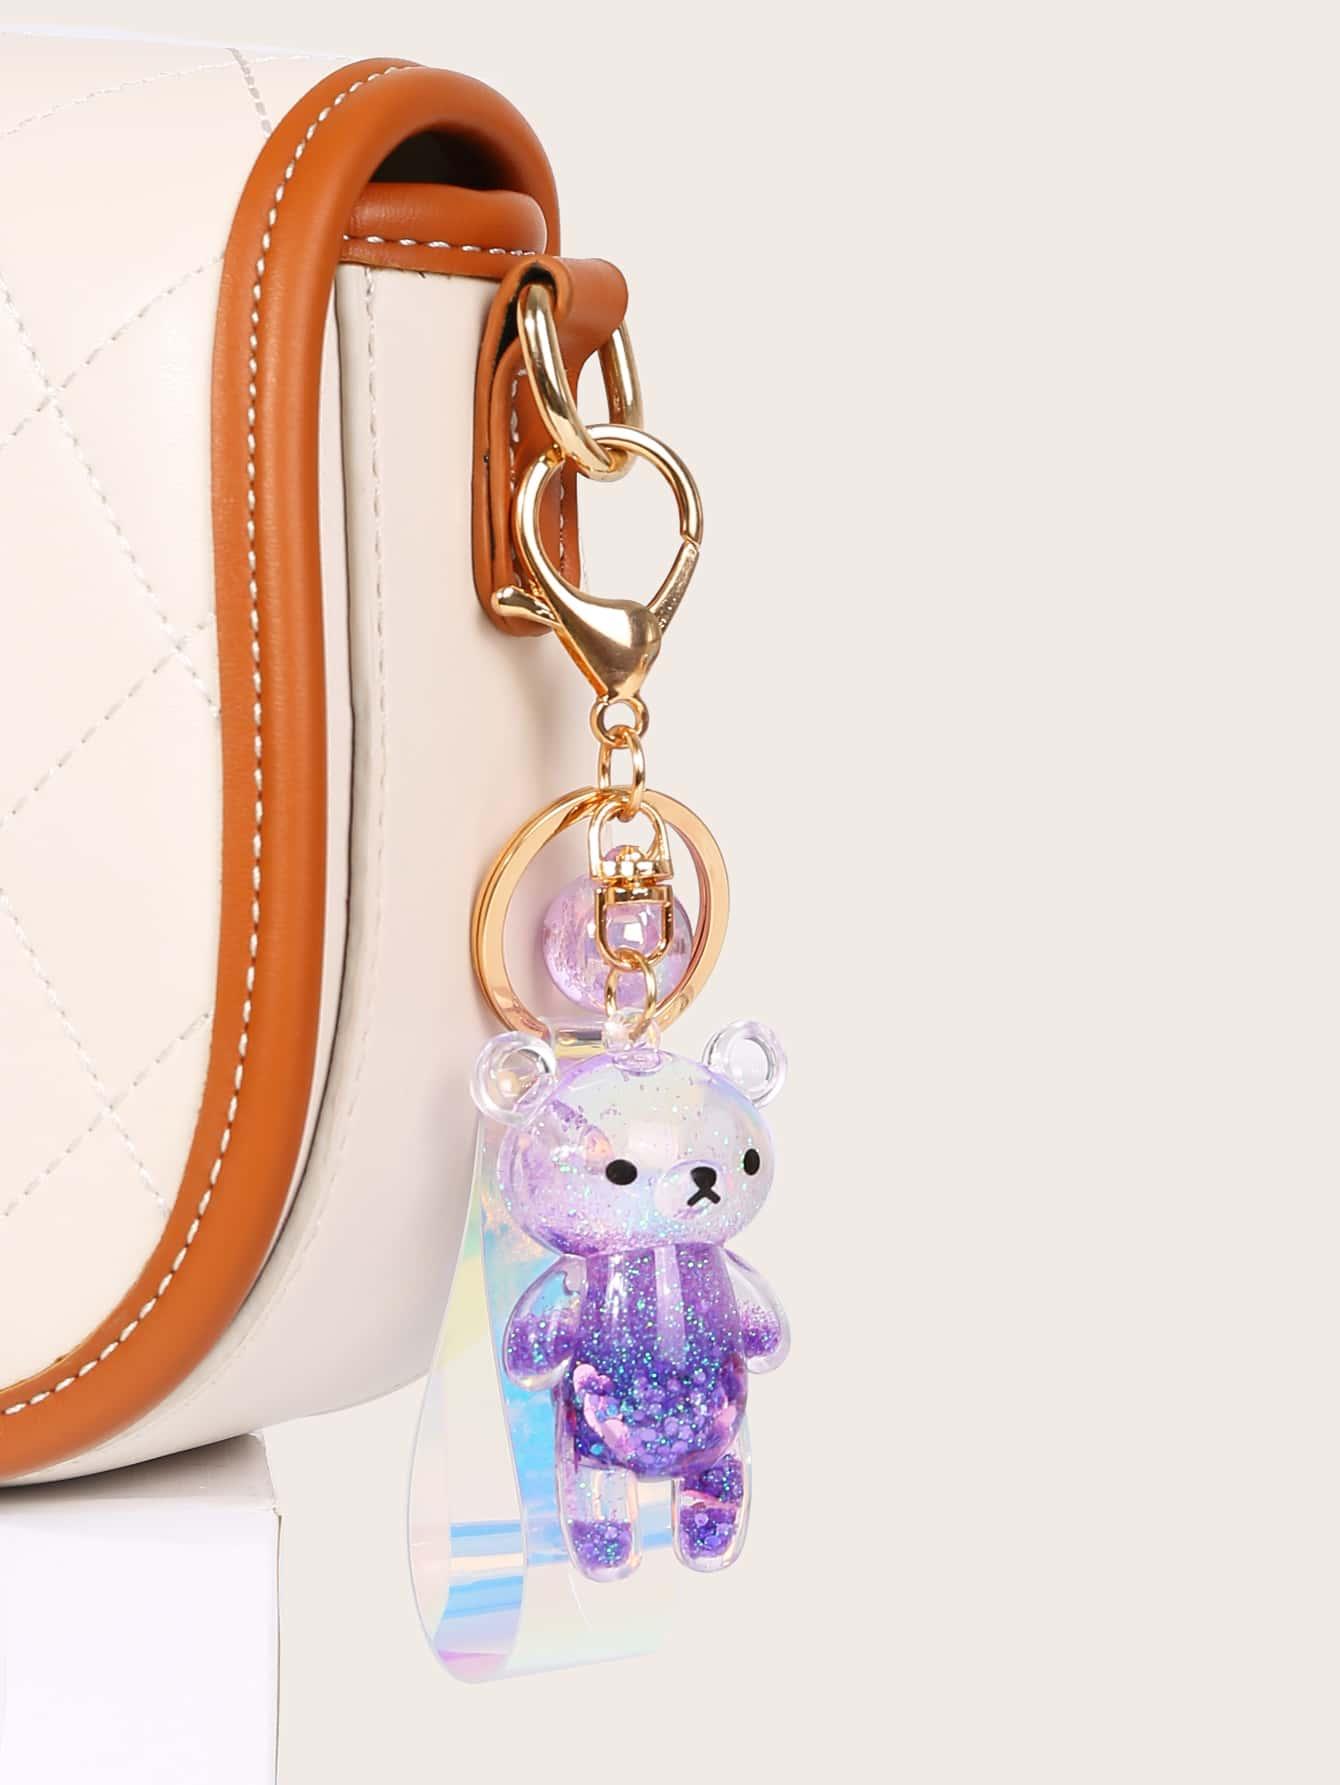 Подвеска для сумки с декором медведяswbag18200602570